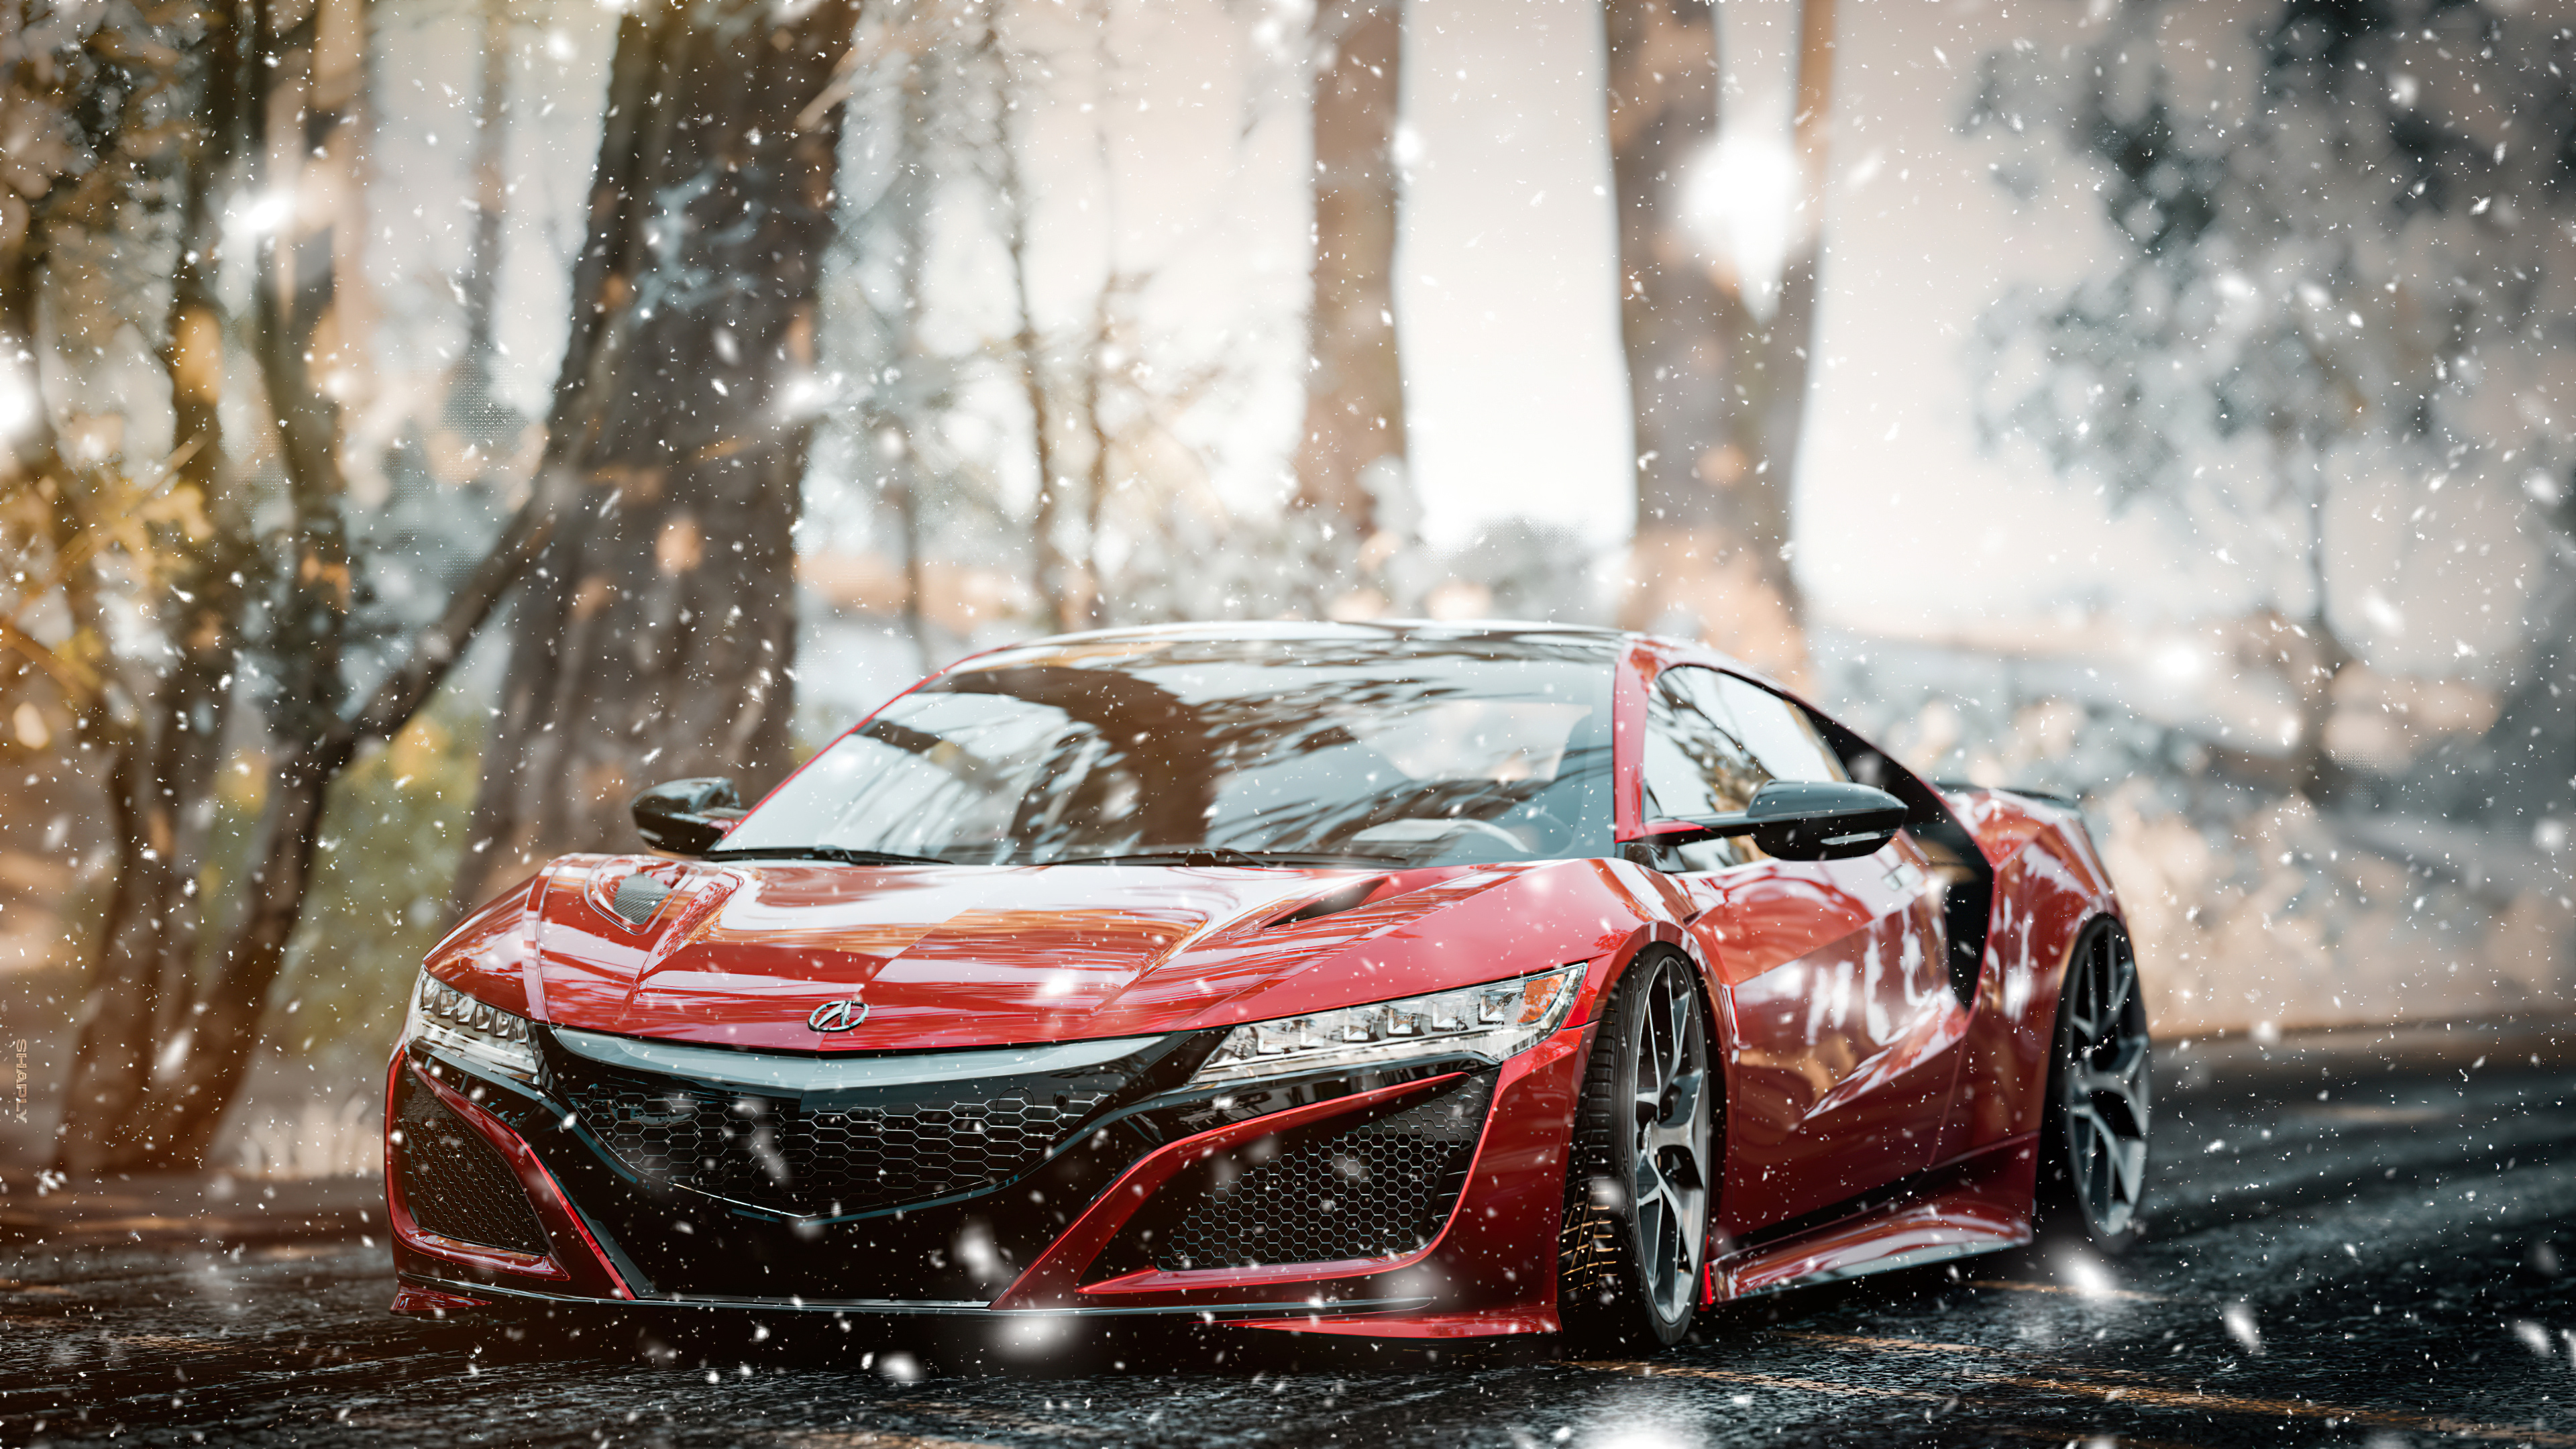 acura nsx forza horizon 4 4k 1615134027 - Acura NSX Forza Horizon 4 4k - Acura NSX Forza Horizon 4 4k wallpapers